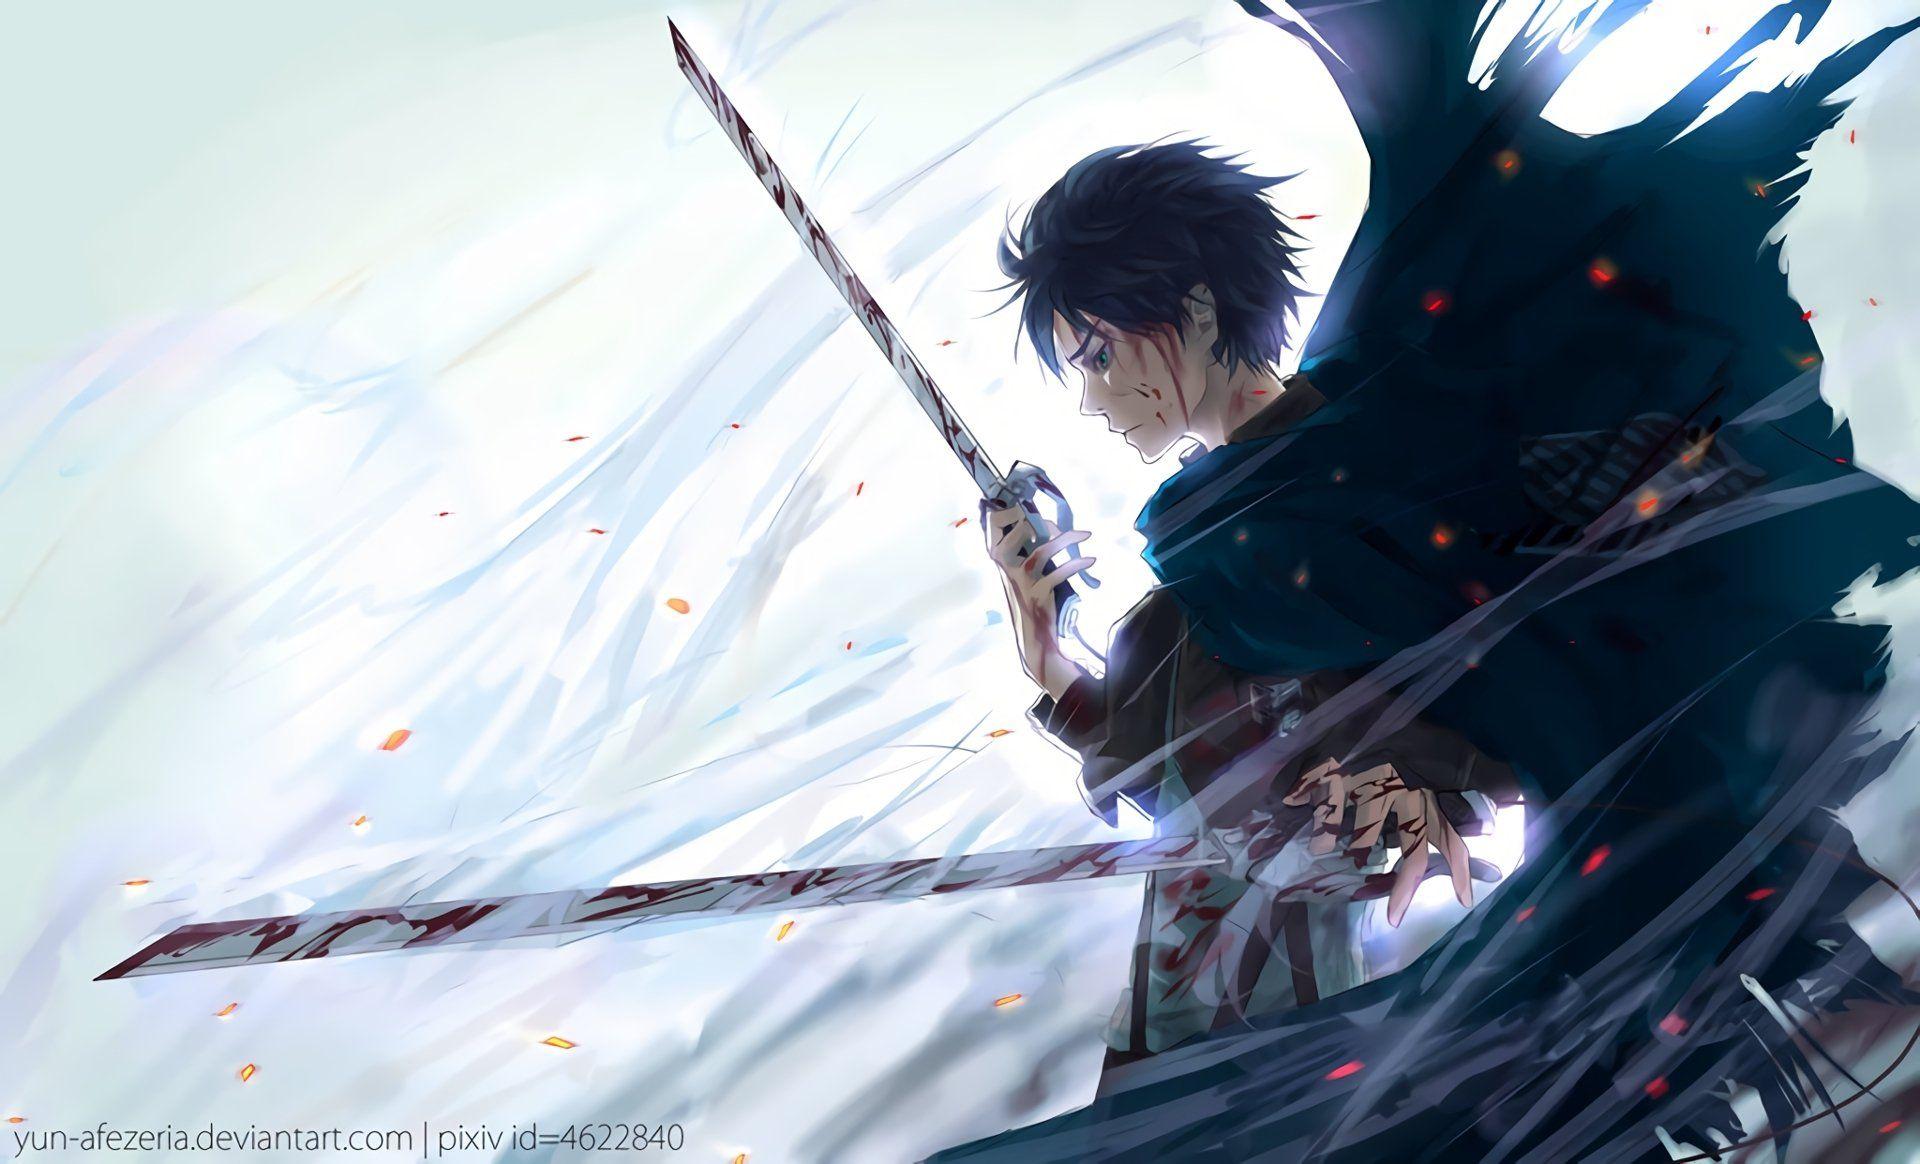 Anime Attack On Titan Shingeki No Kyojin Eren Yeager